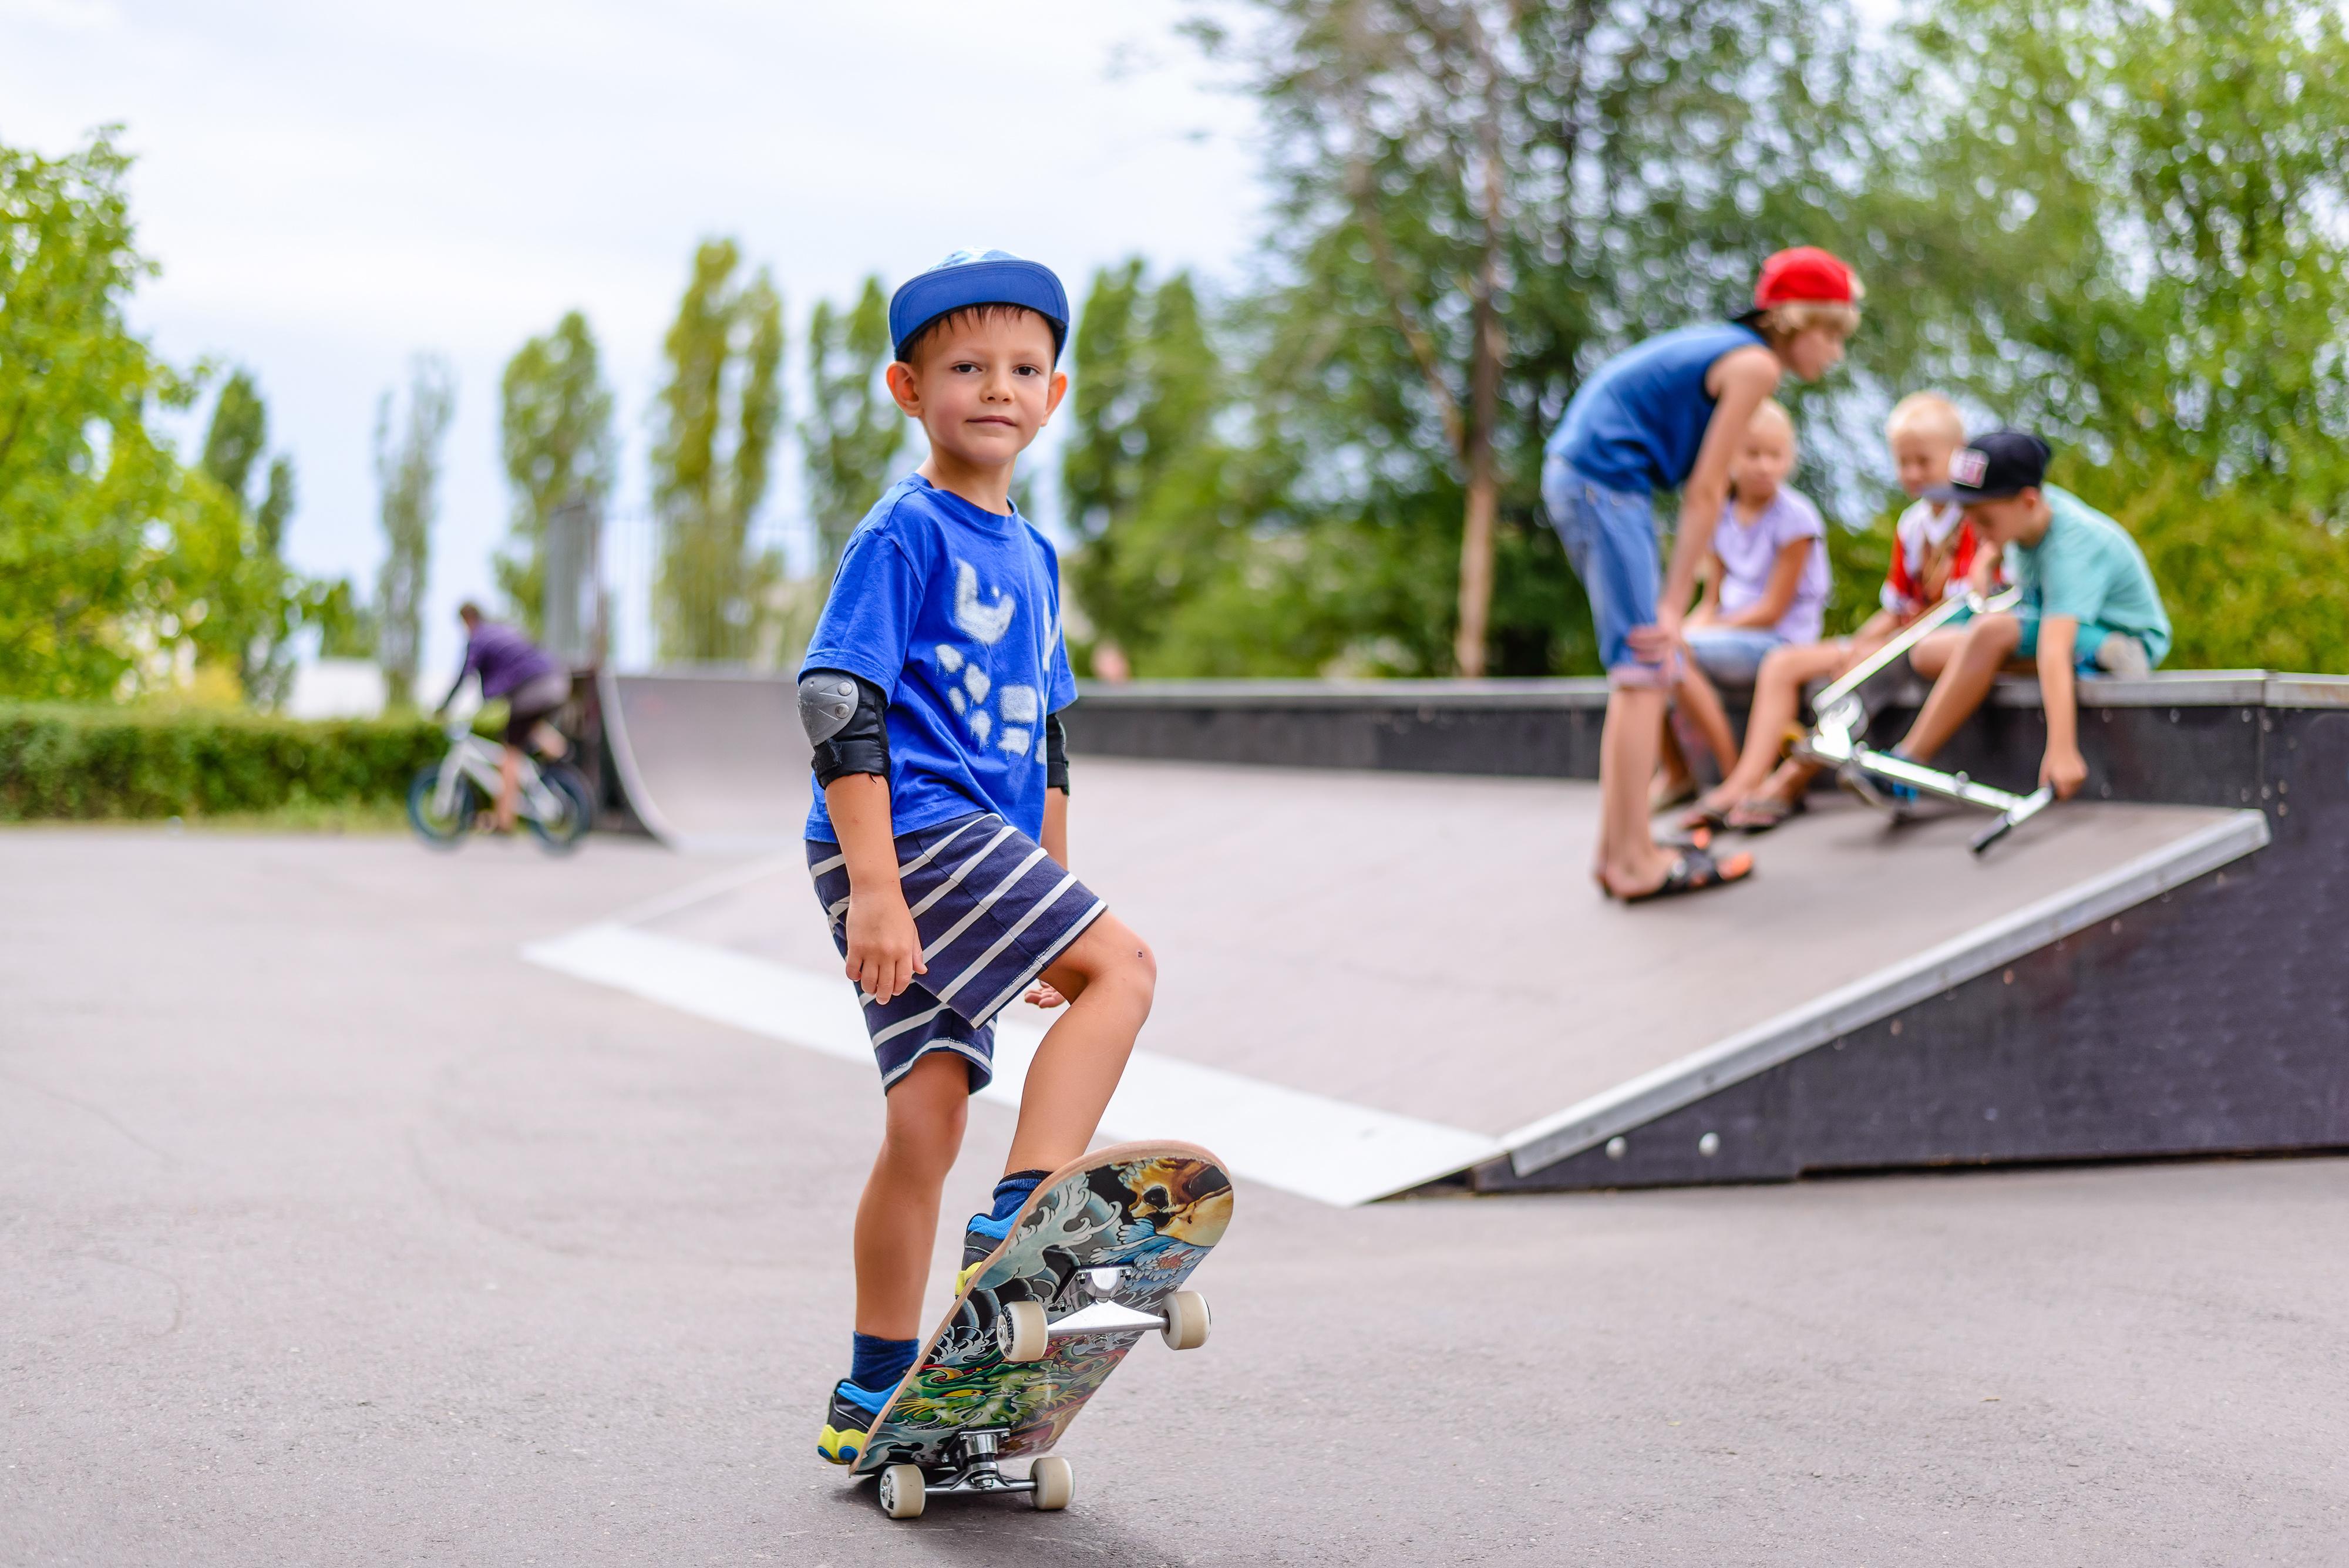 Übung mit dem Skateboard